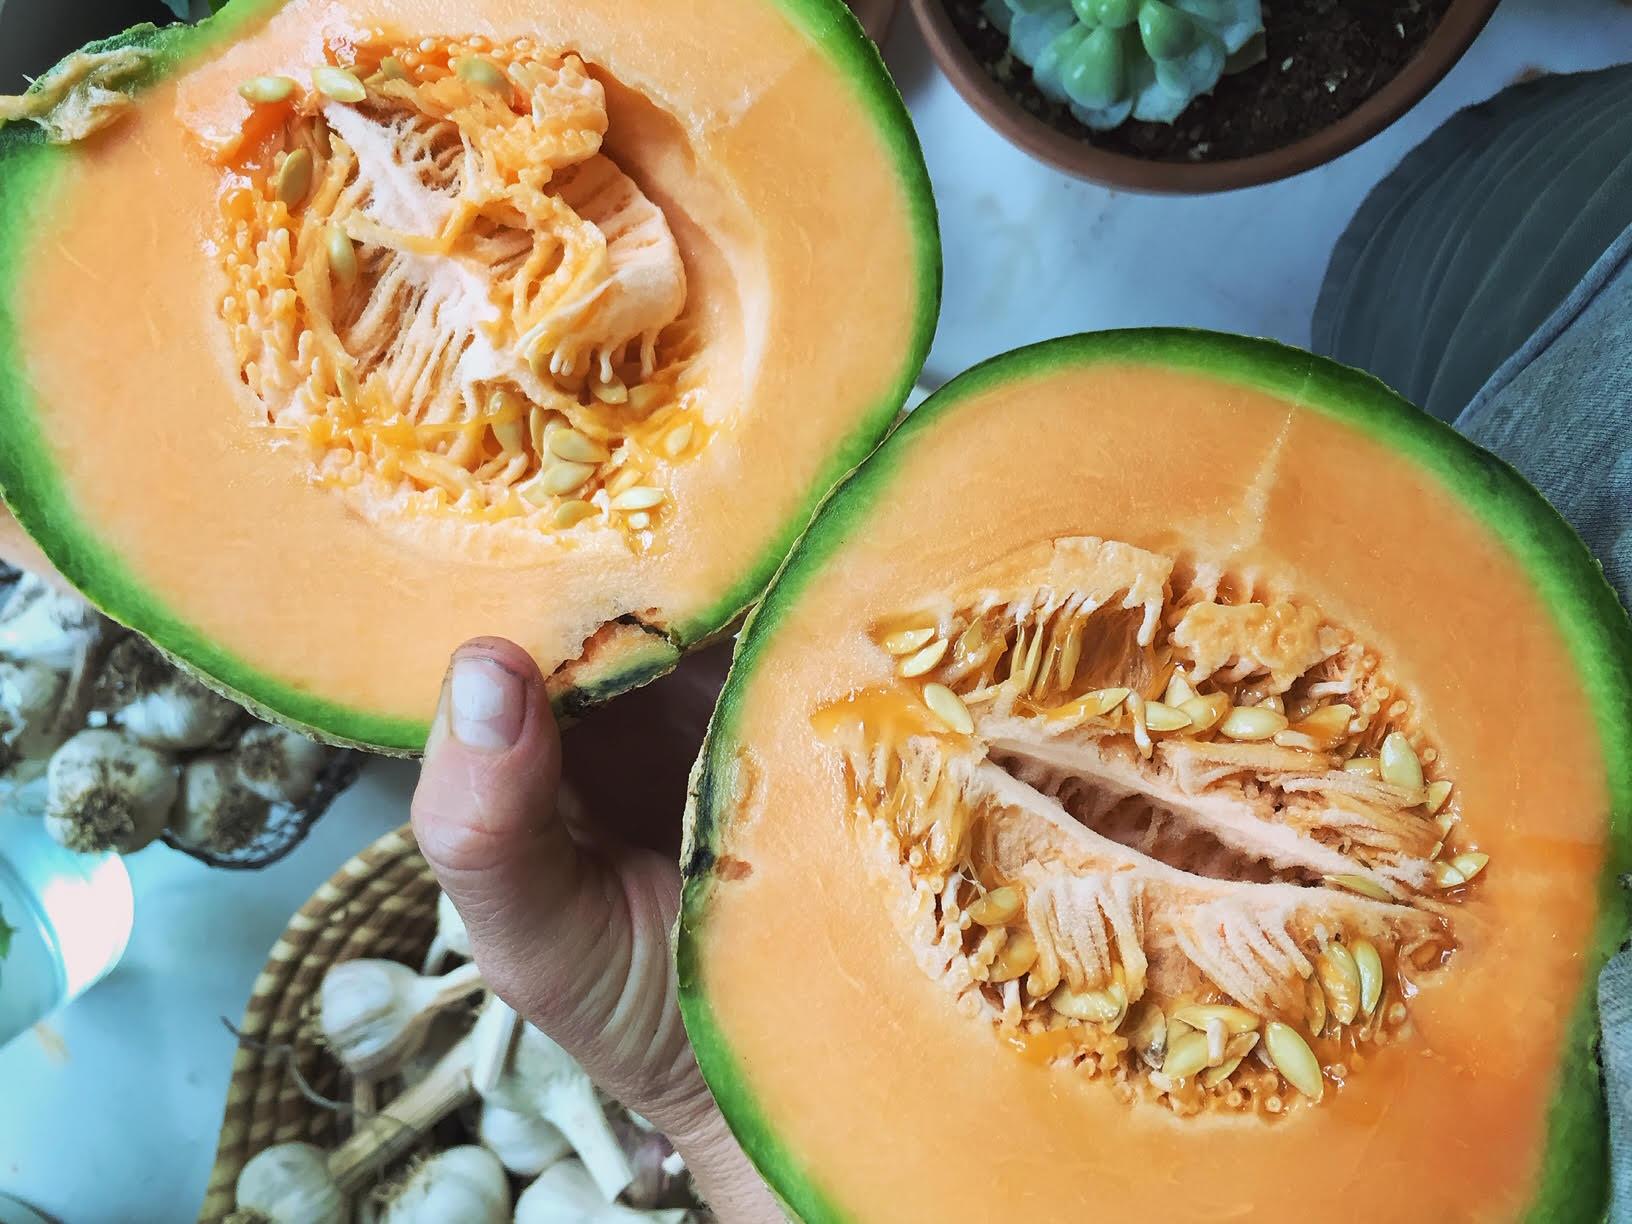 Cantaloupe.jpg